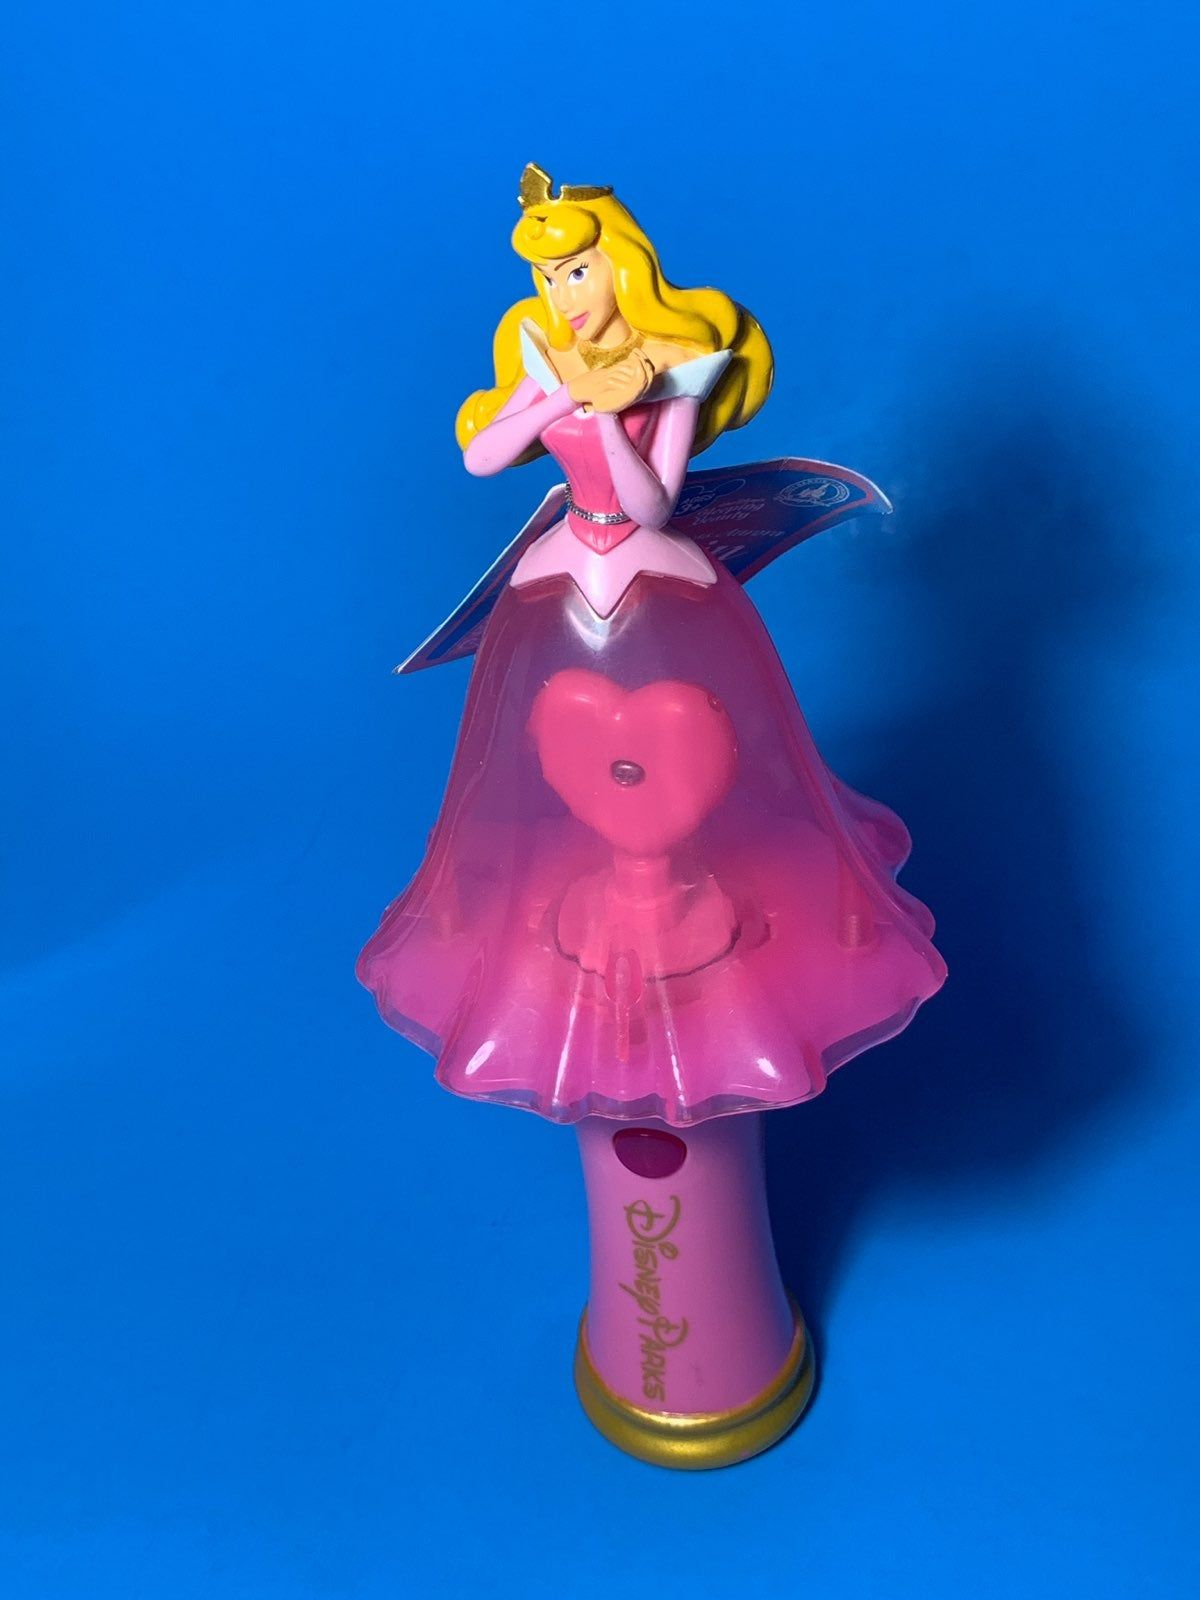 Pin on Disney Toys & Games